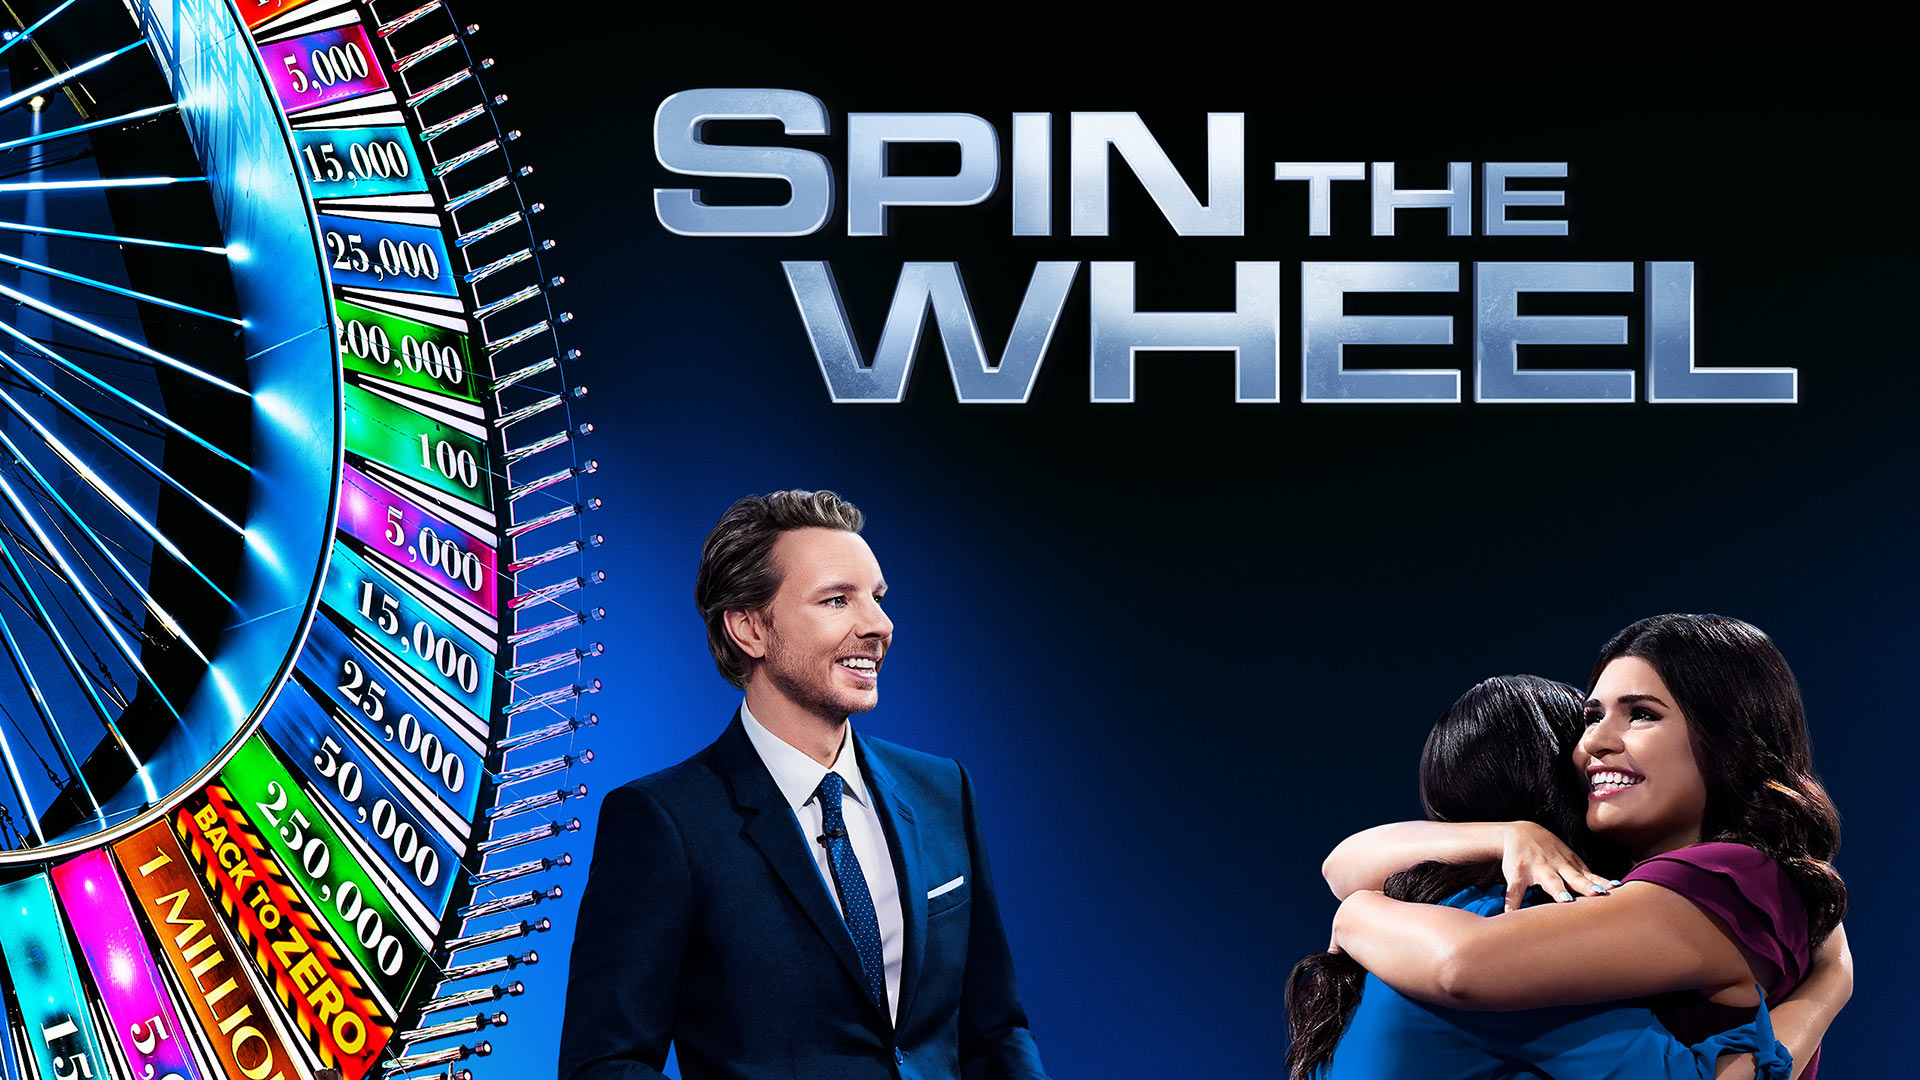 Spin The Wheel Season 1